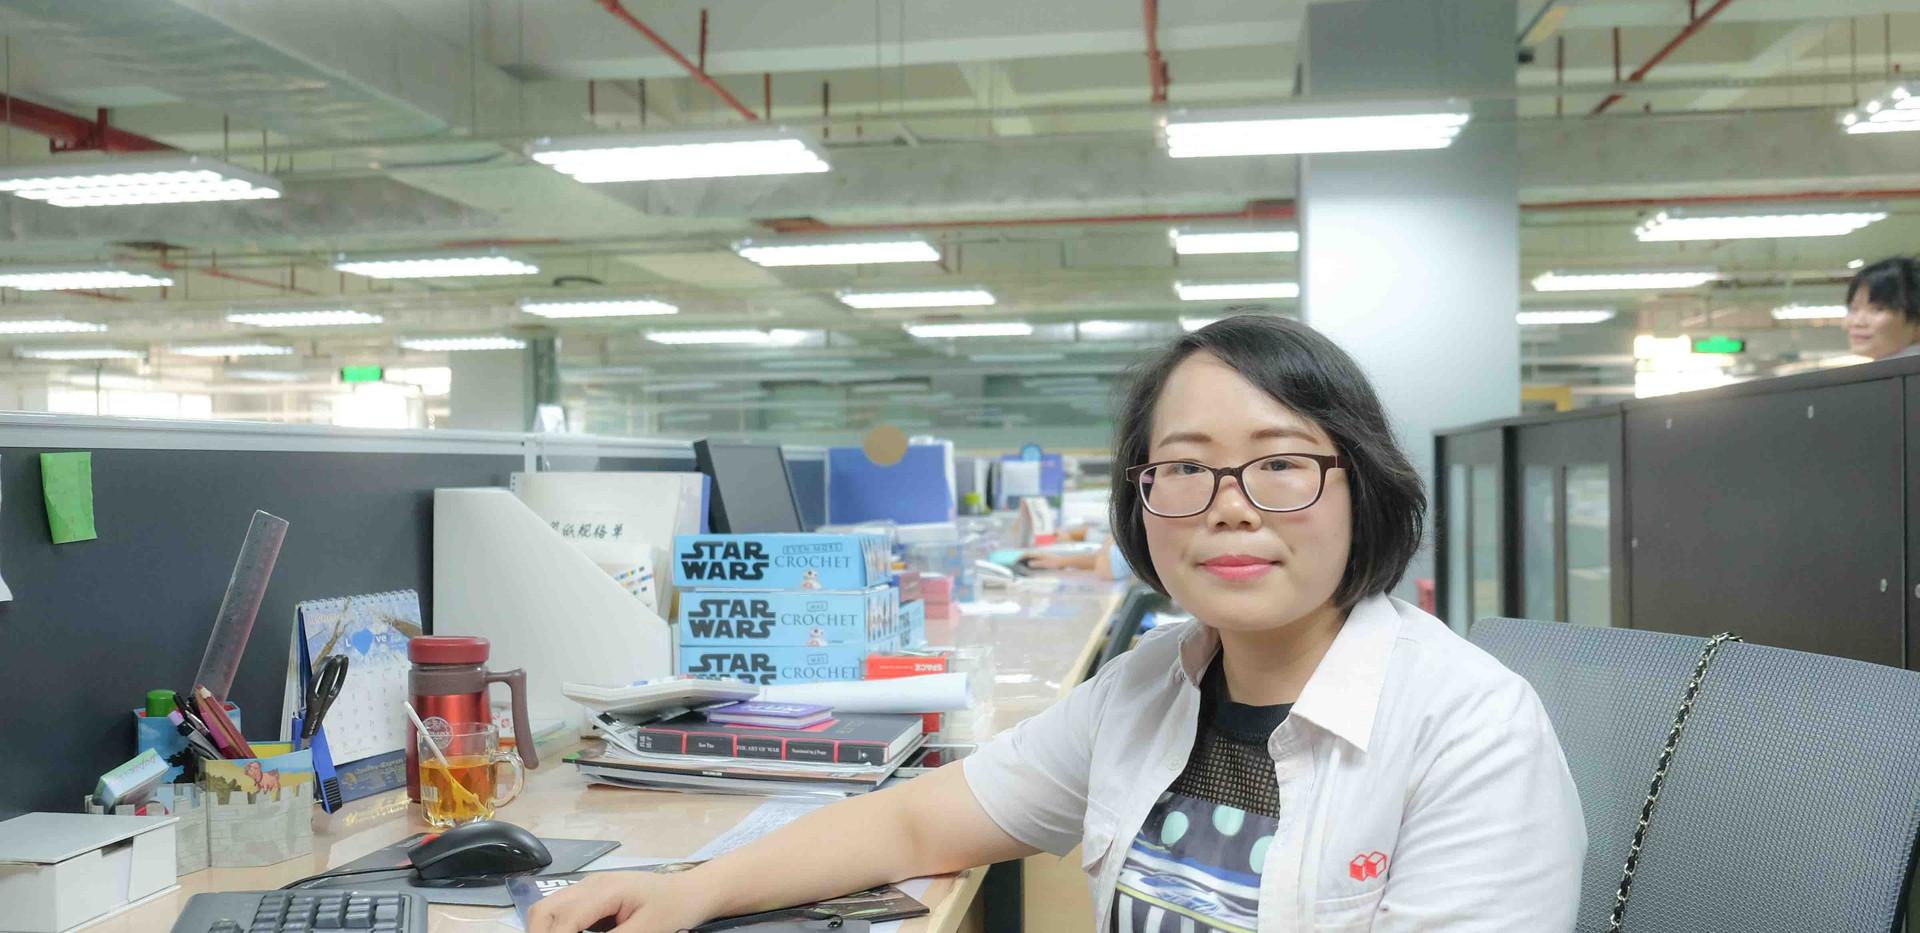 SandyTang_China(HungHingFactory)_2019_H